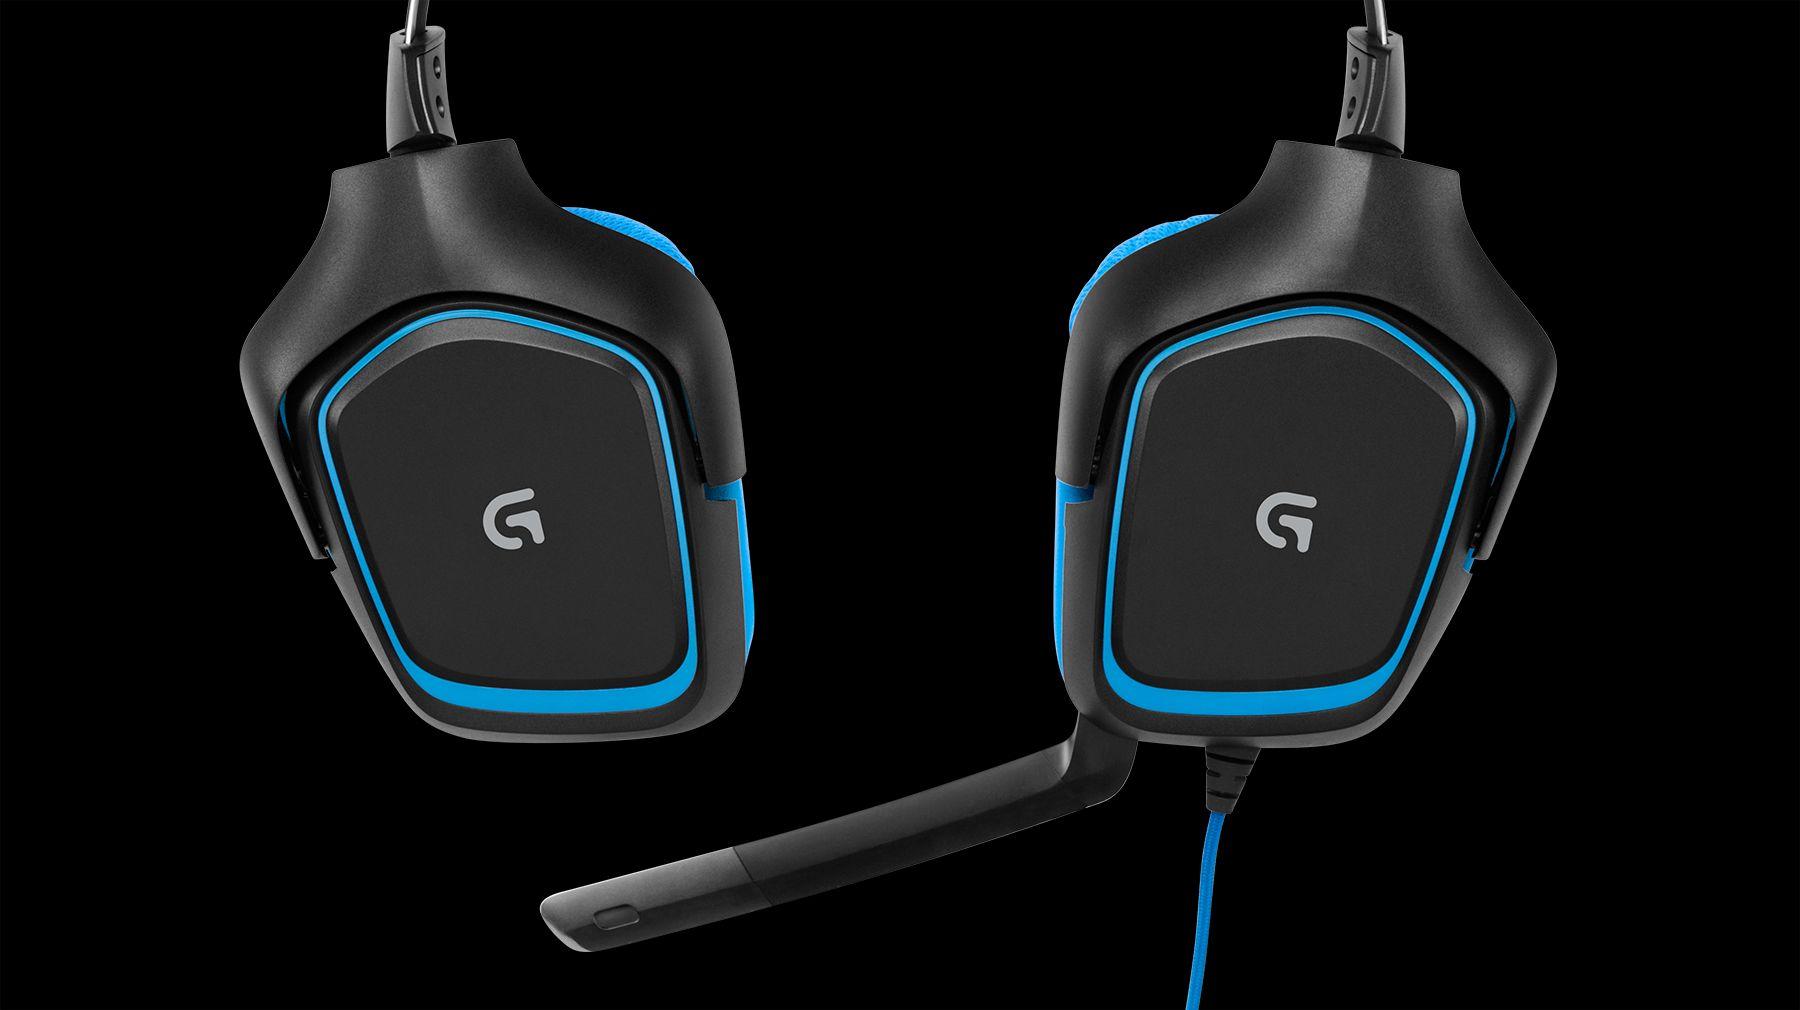 Comprar Cascos Gaming Logitech G430 baratos